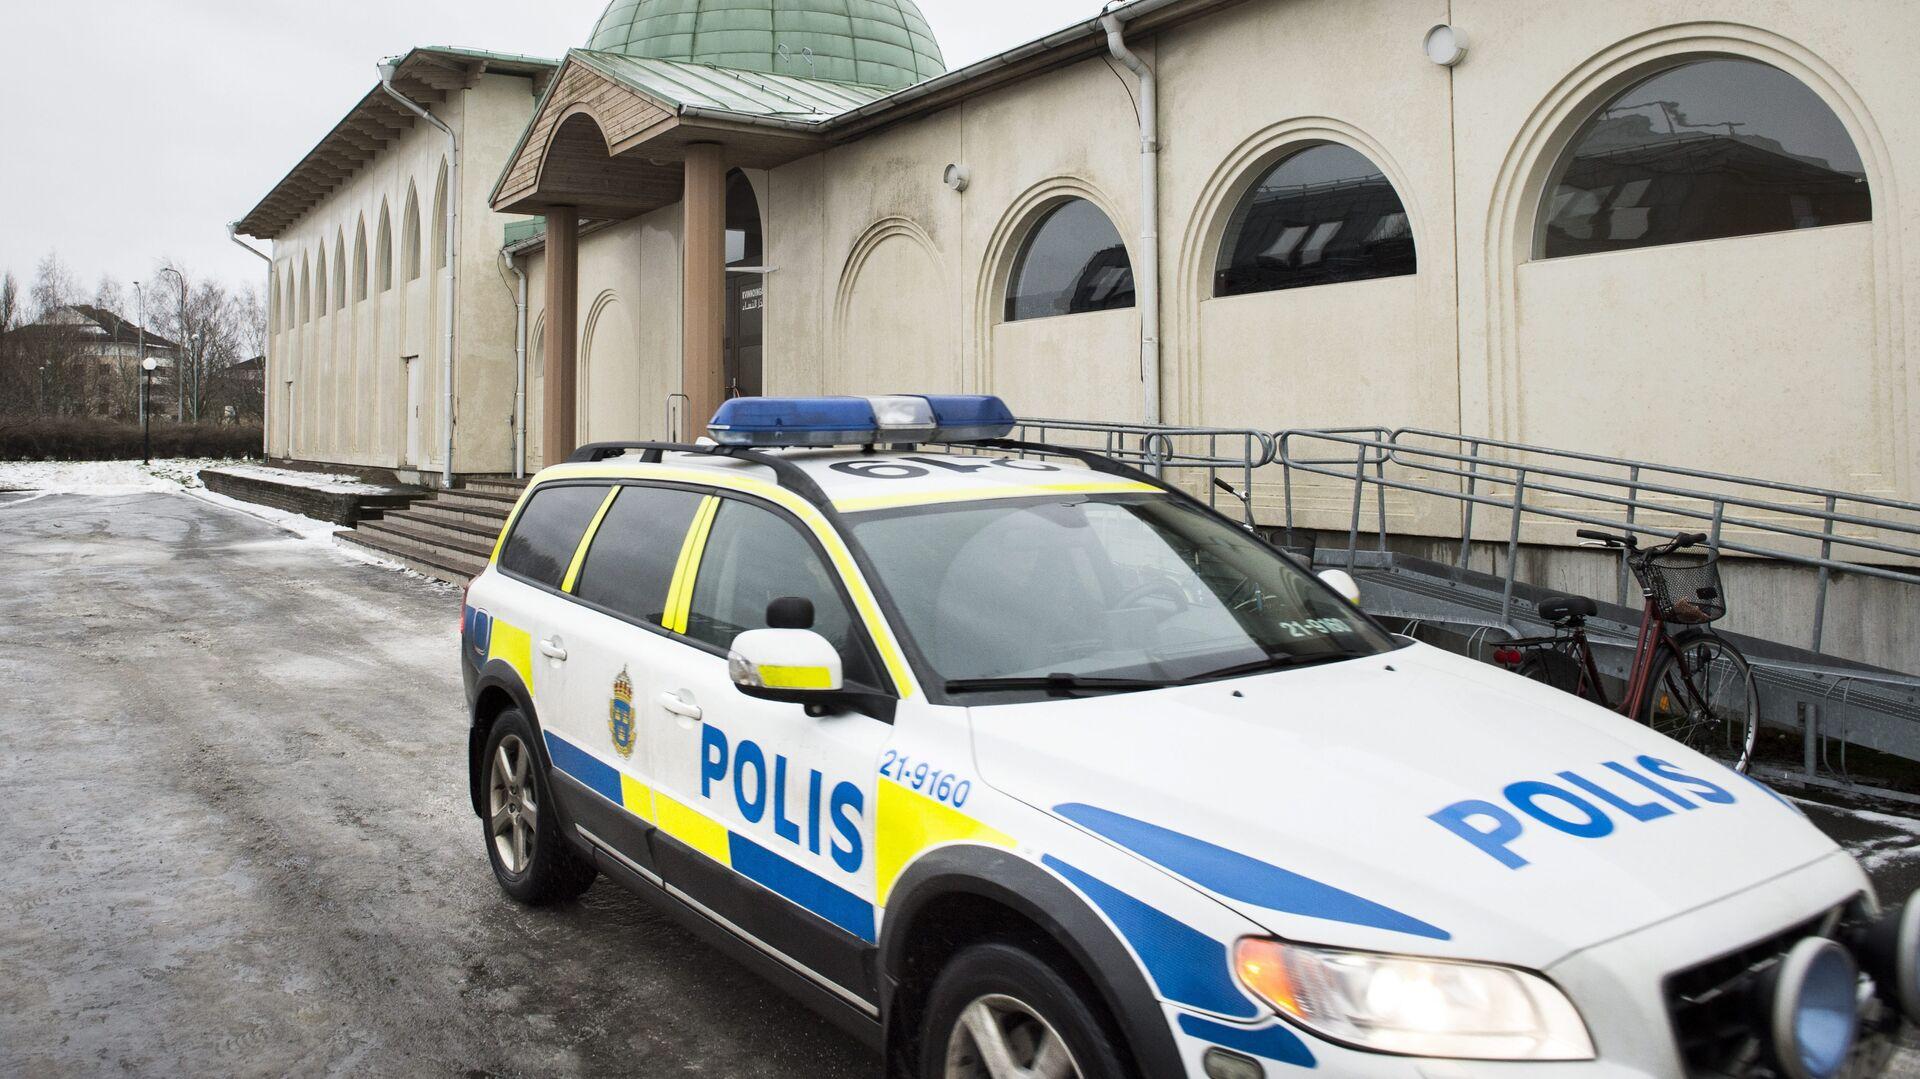 (File) A police car is parked in front of a mosque in Uppsala, Sweden Thursday Jan. 1, 2015 - Sputnik International, 1920, 23.09.2021